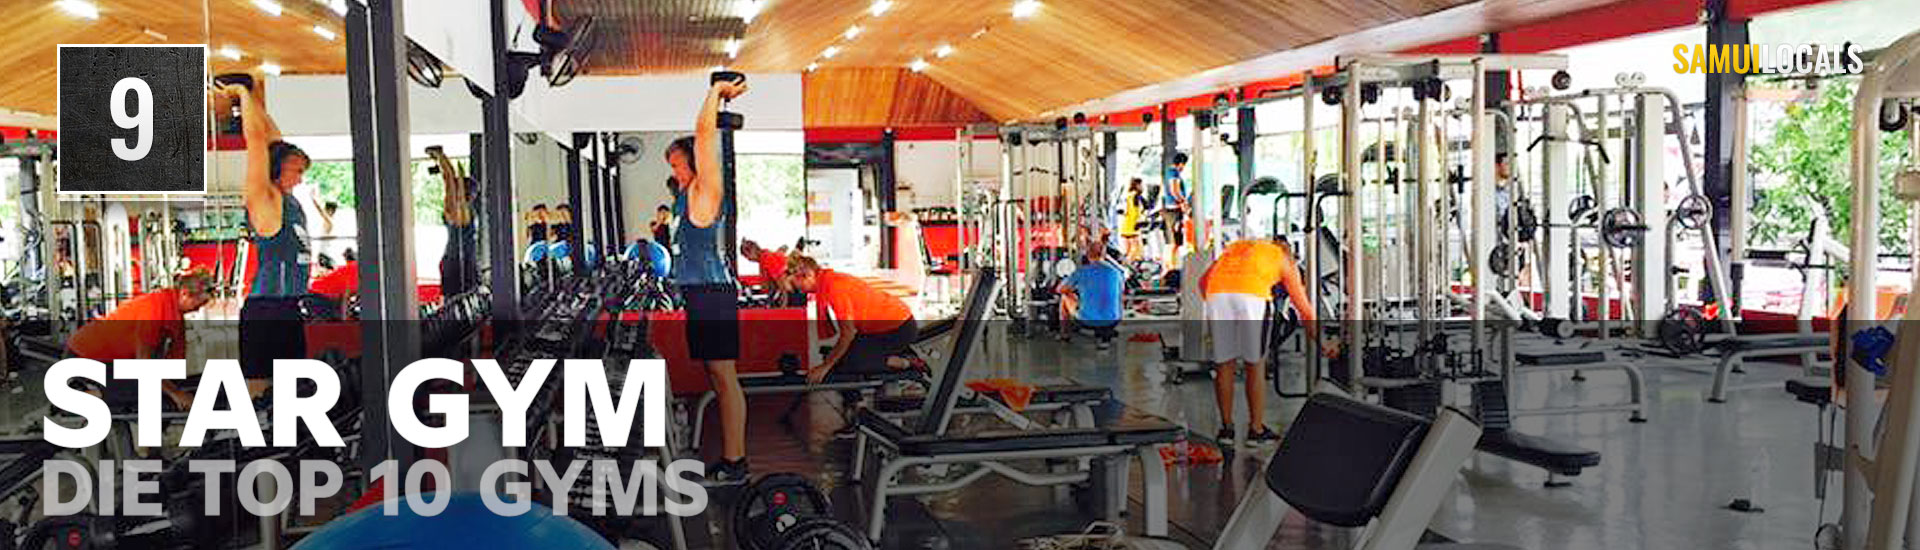 Top_10_gyms_star_gym